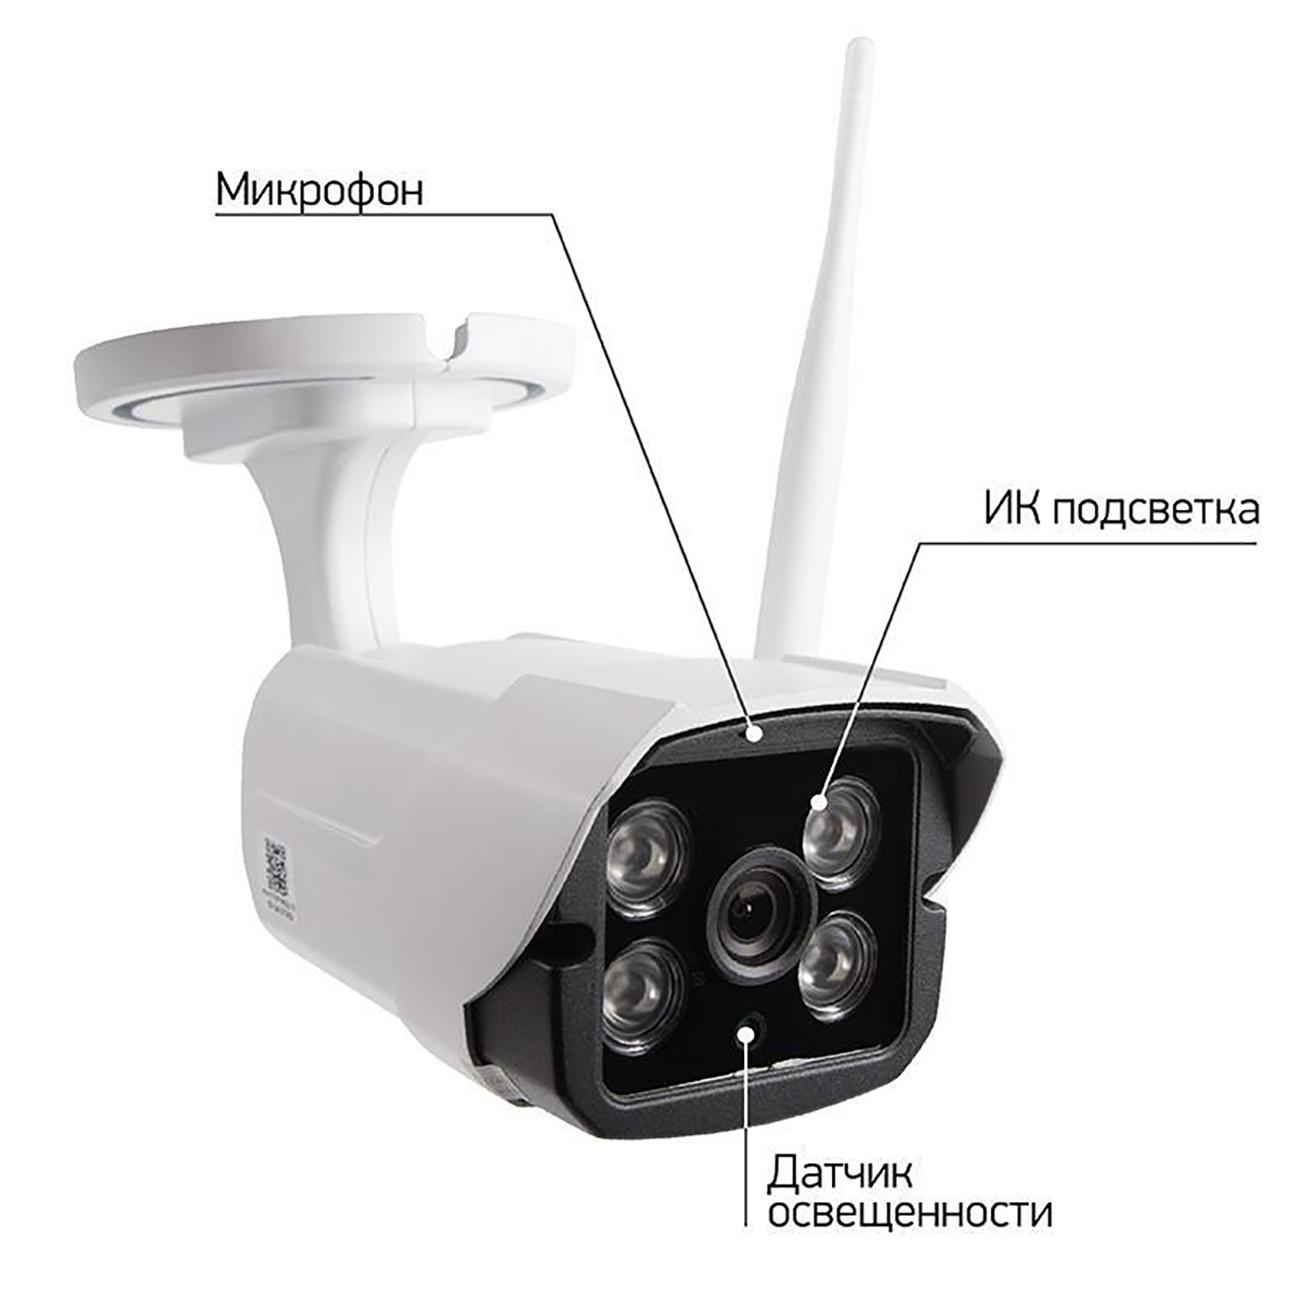 Фото Беспроводная уличная 4G (LTE) Smart камера Rexant {45-0270} (1)